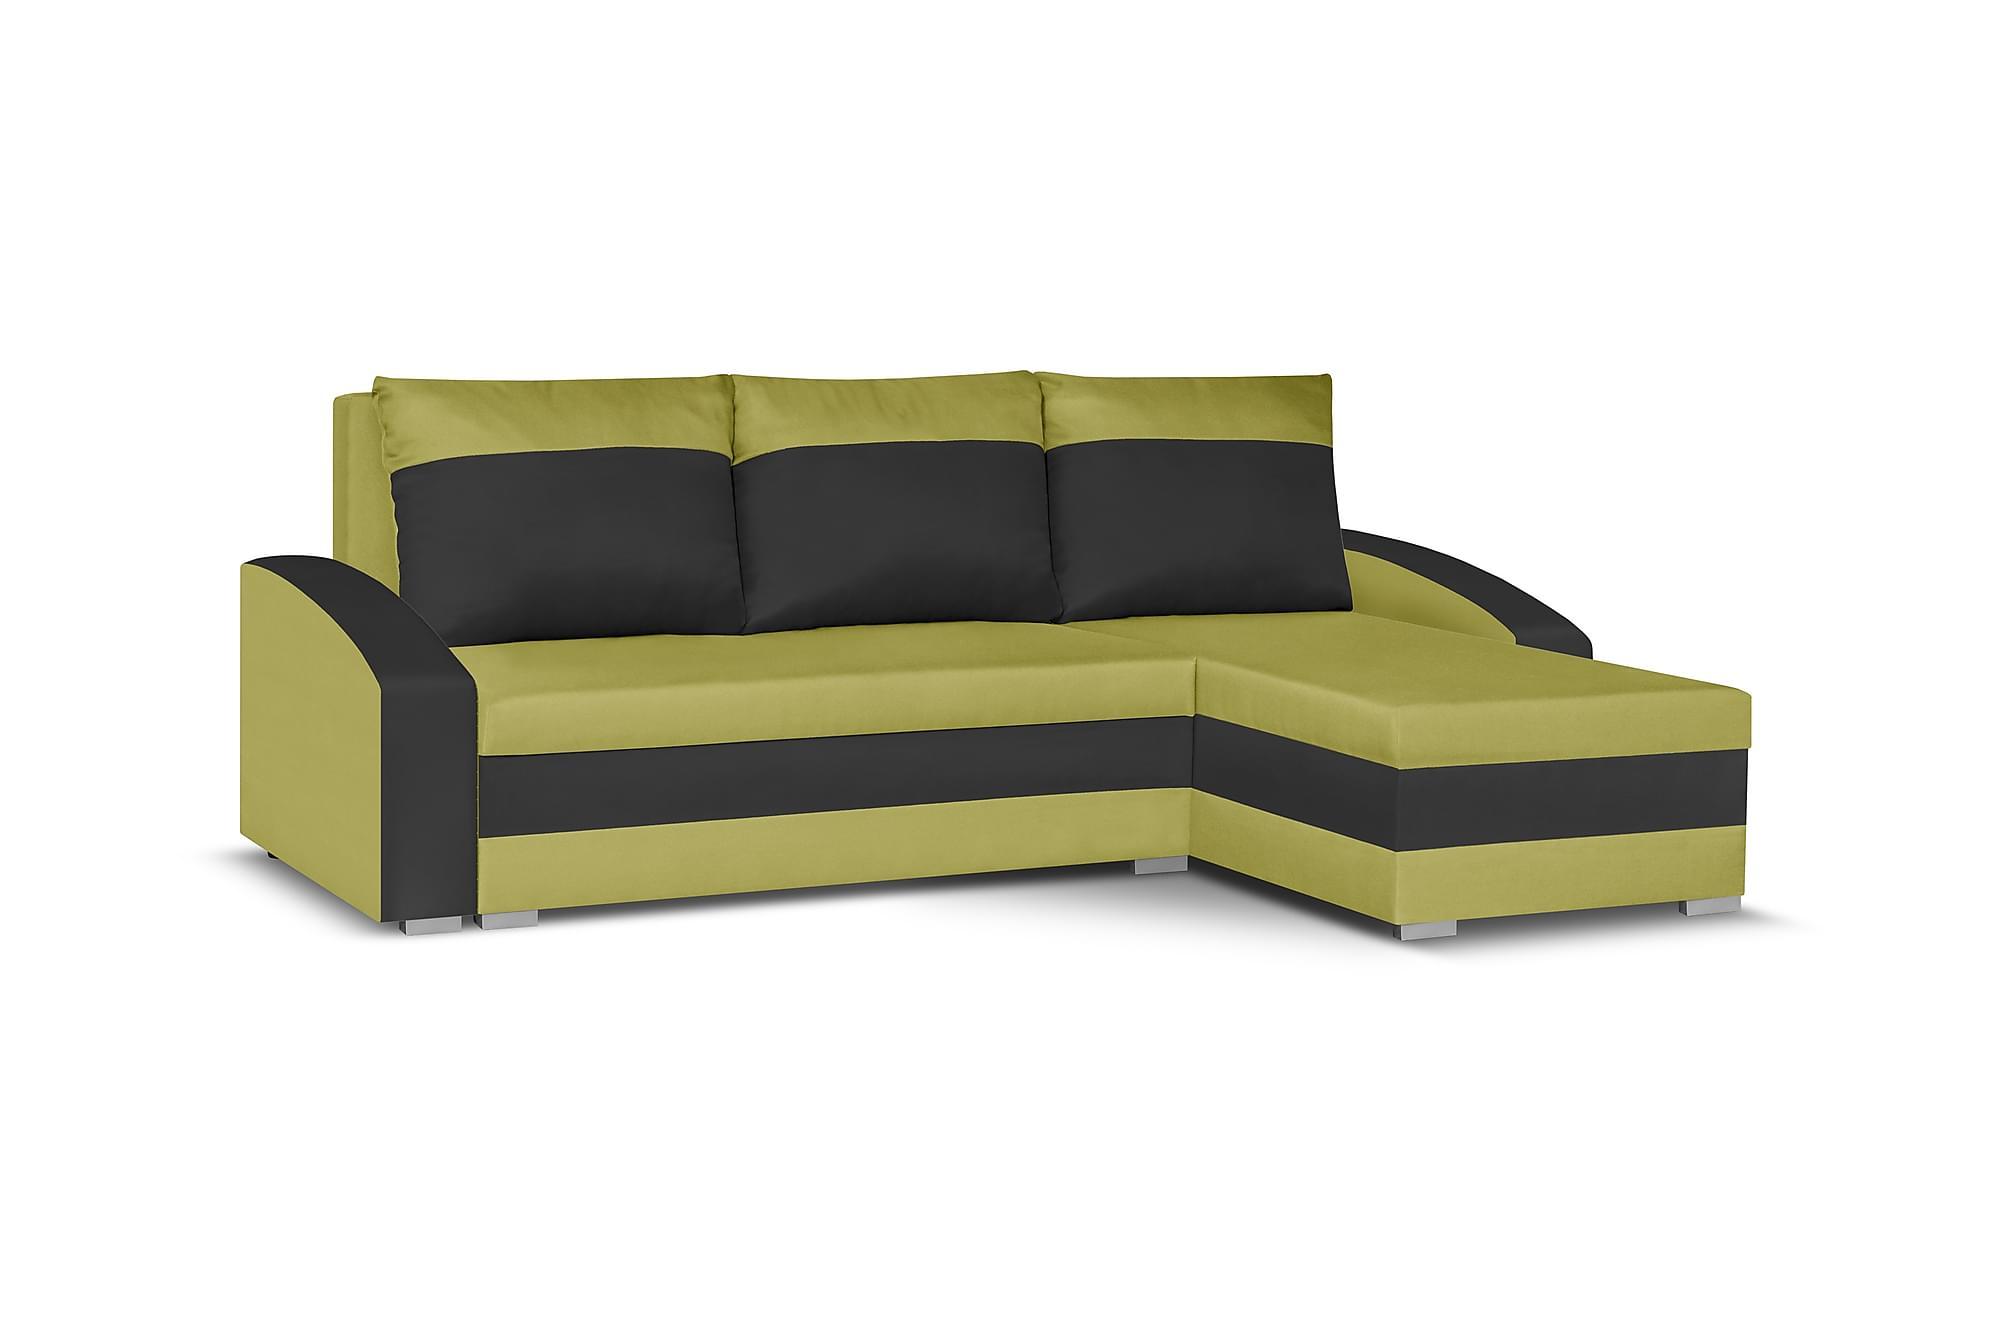 Banyoles divanbäddsoffa grön/svart